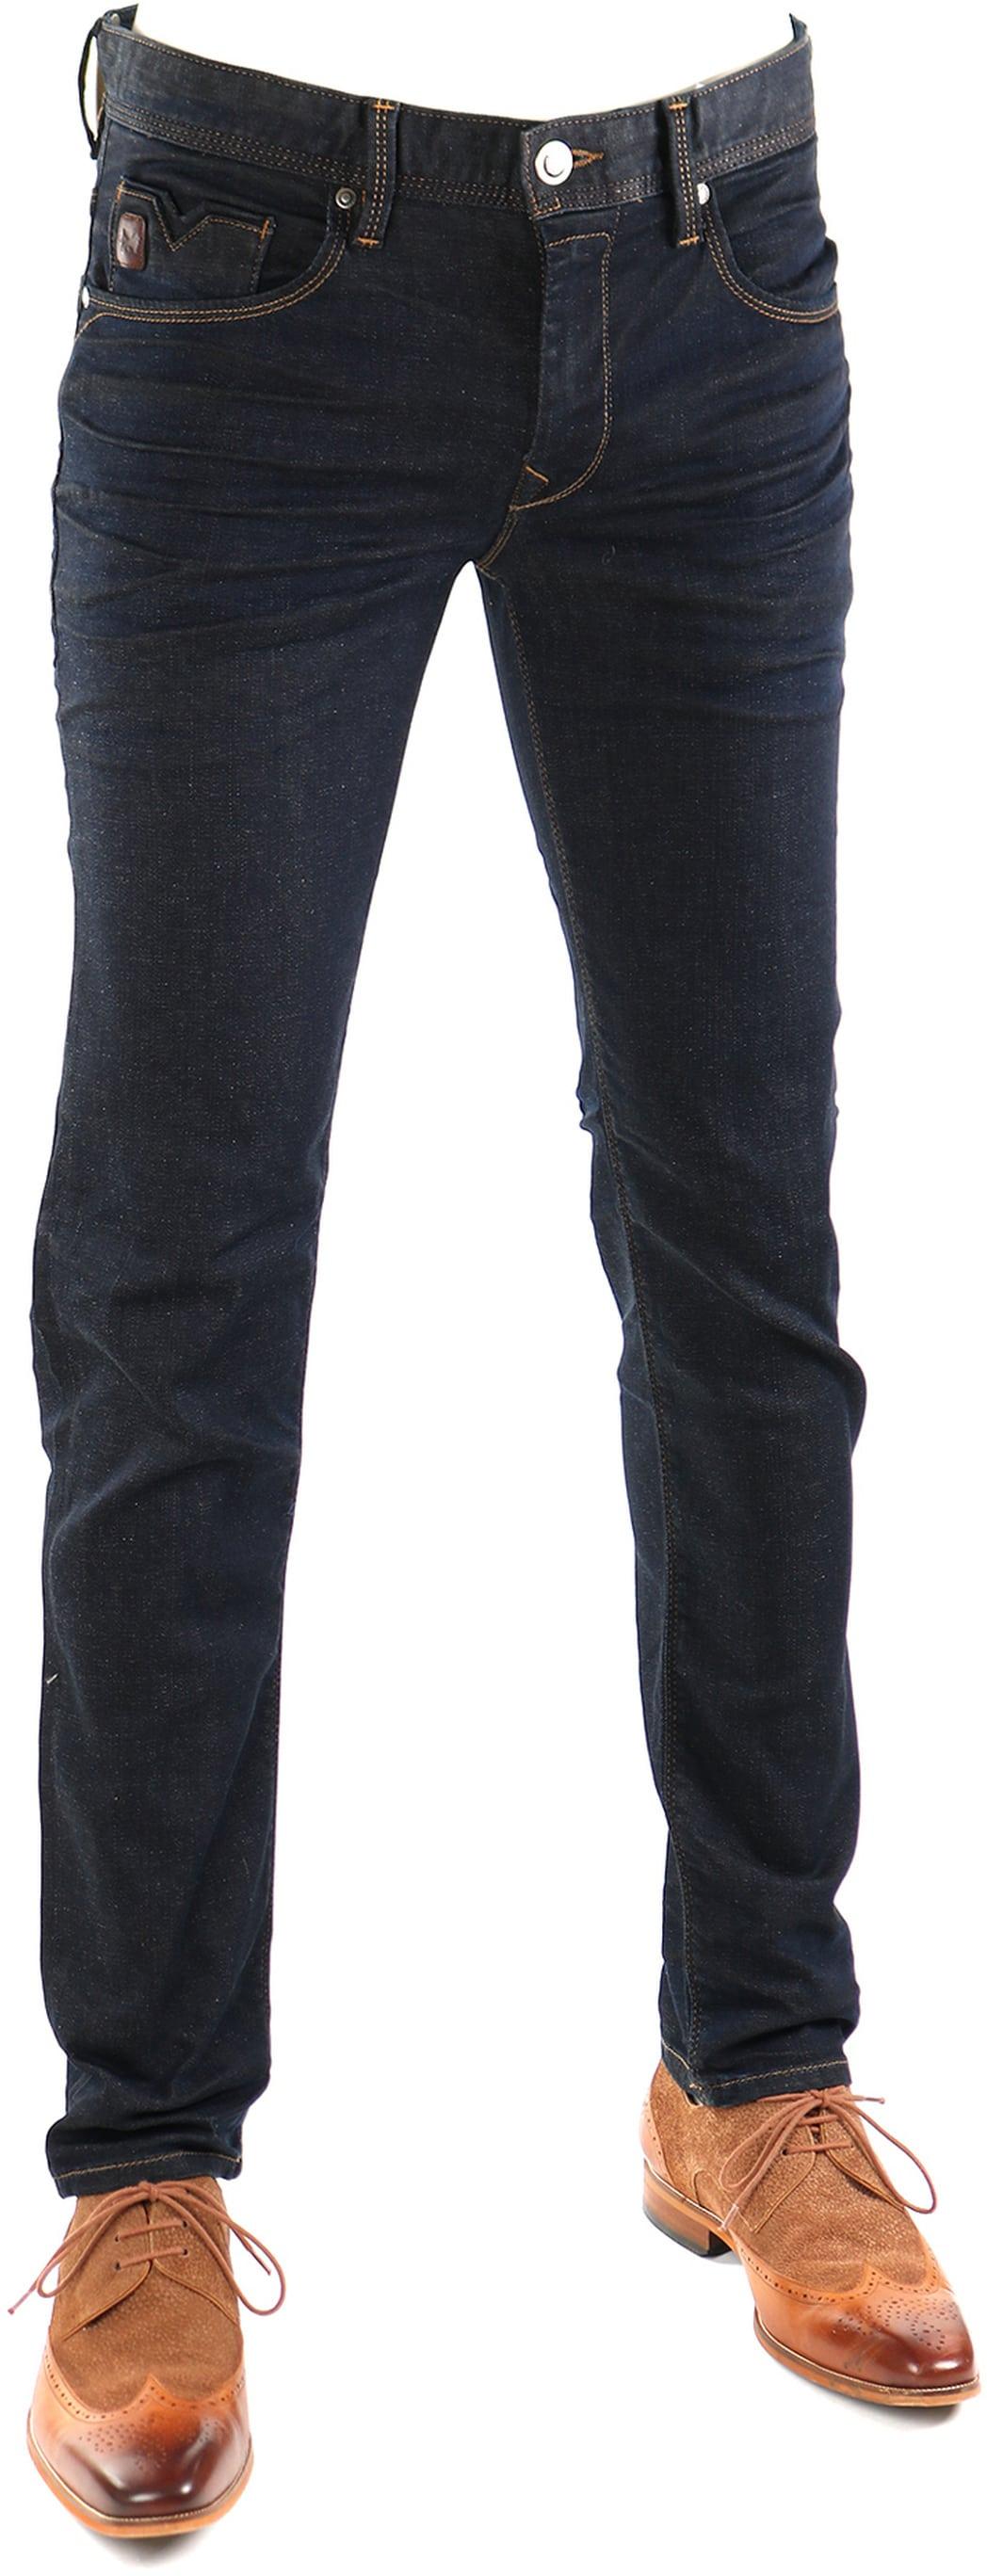 Vanguard V7 Slim Jeans Stretch CCR foto 0